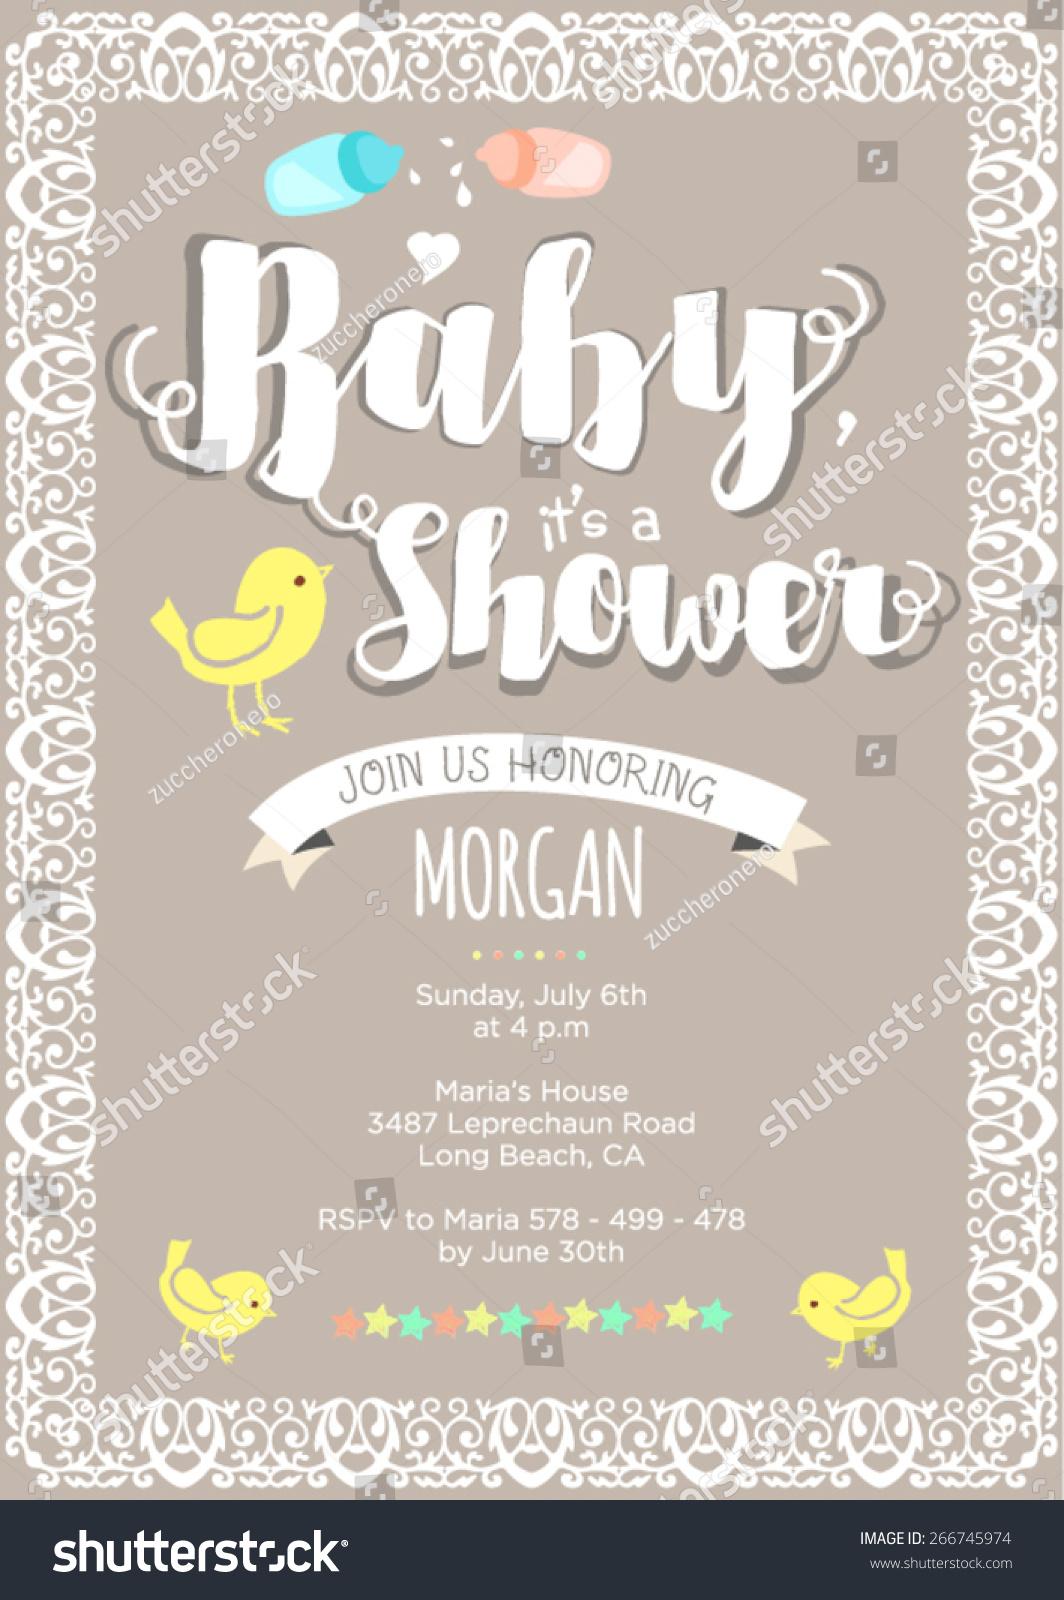 Baby Shower Clip Art Gender Neutral : shower, gender, neutral, Gender, Neutral, Shower, Invitation, Layout, Stock, Vector, (Royalty, Free), 266745974